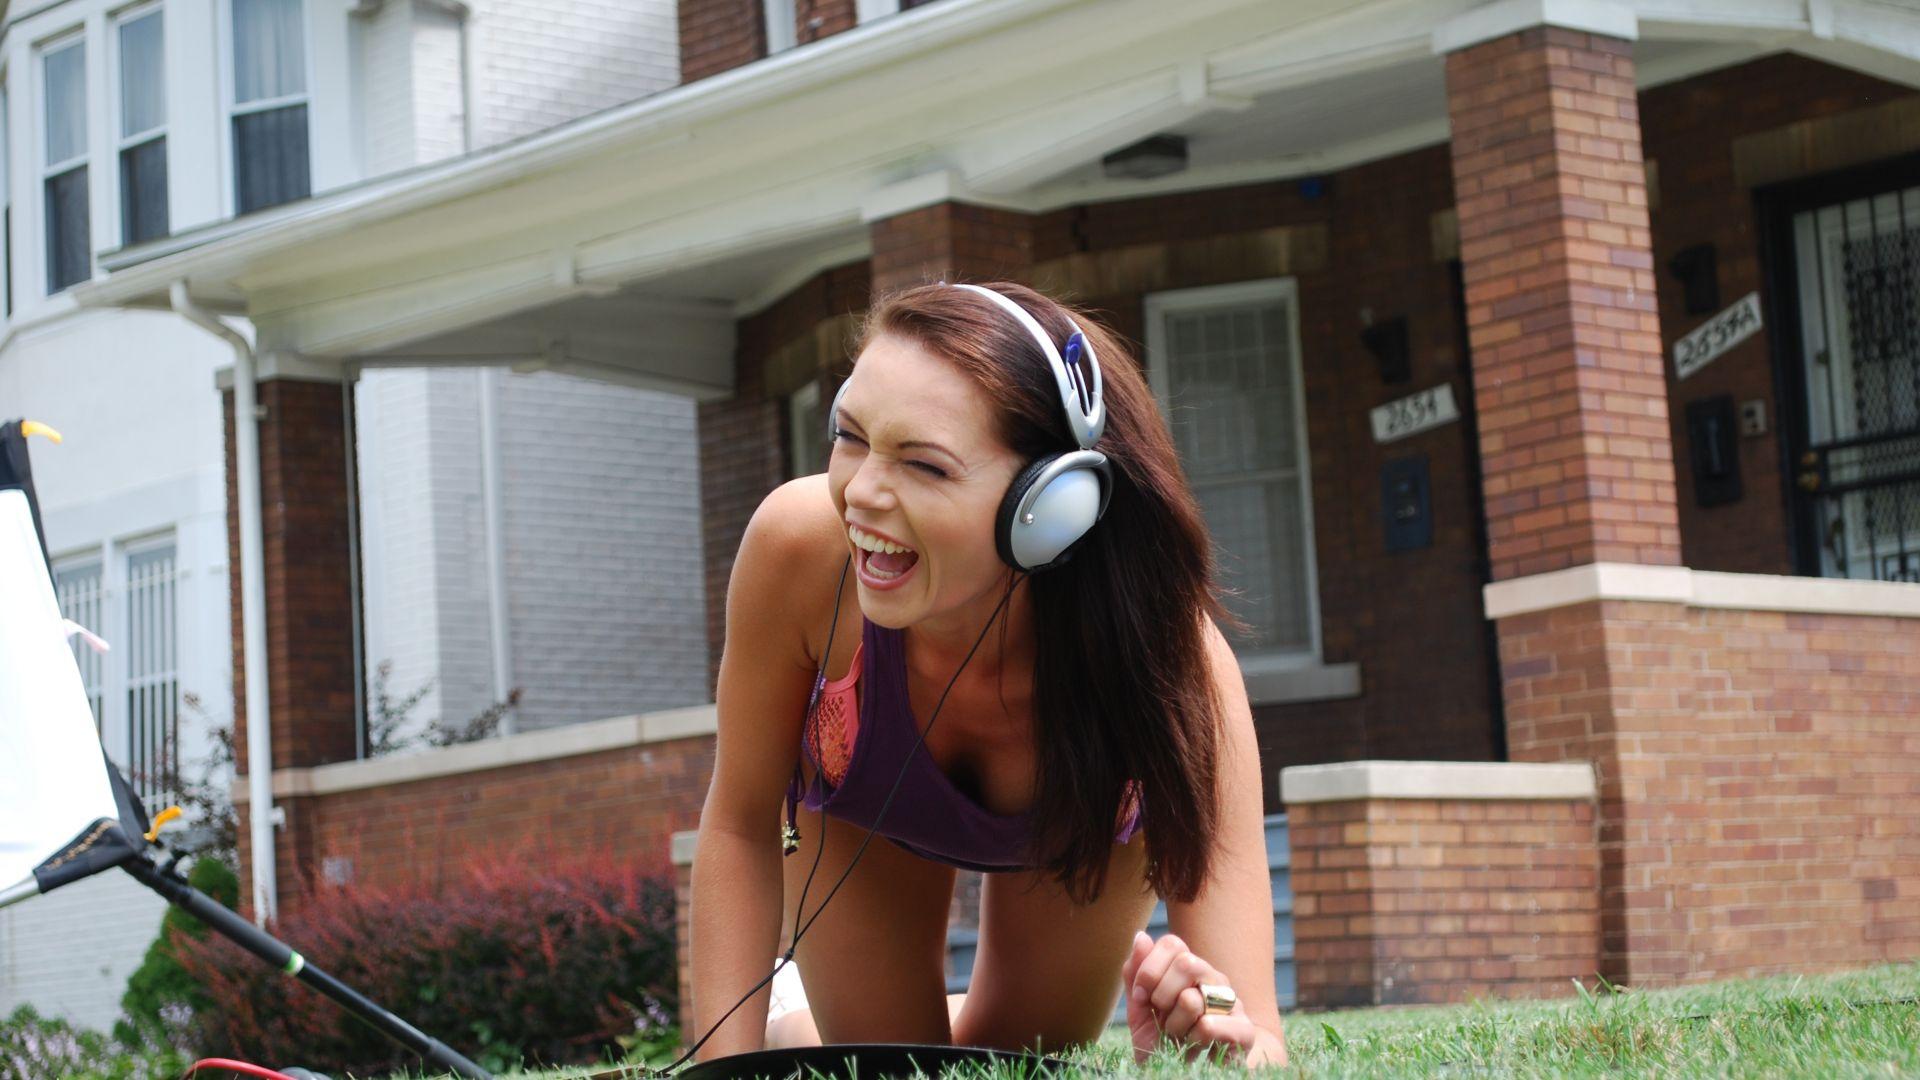 Immagine 13: Miss Tuning: il calendario 2011